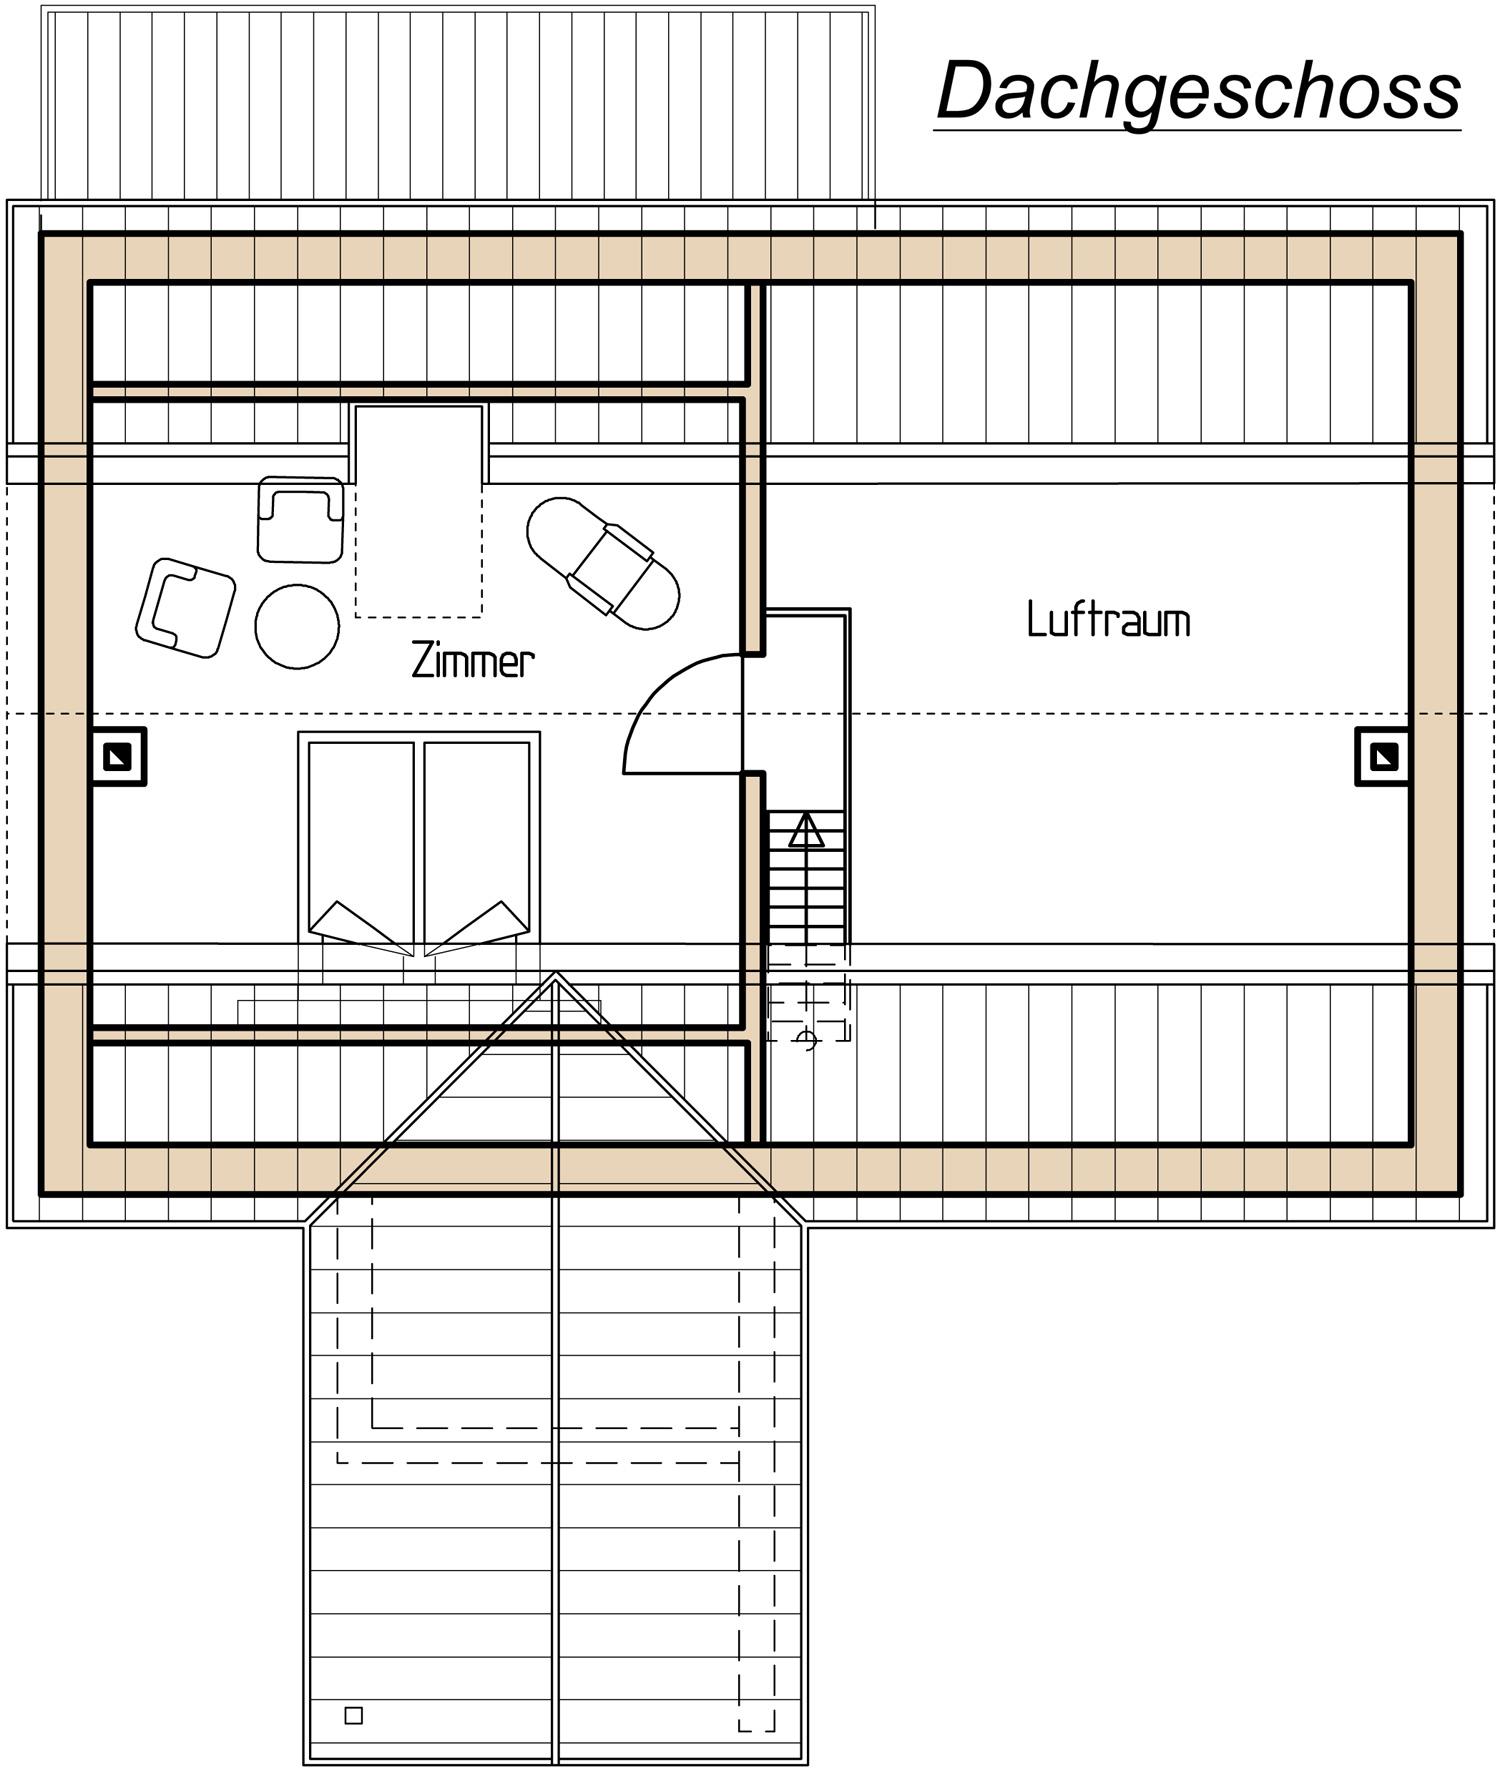 sch n gas zentralheizung ideen elektrische schaltplan ideen. Black Bedroom Furniture Sets. Home Design Ideas